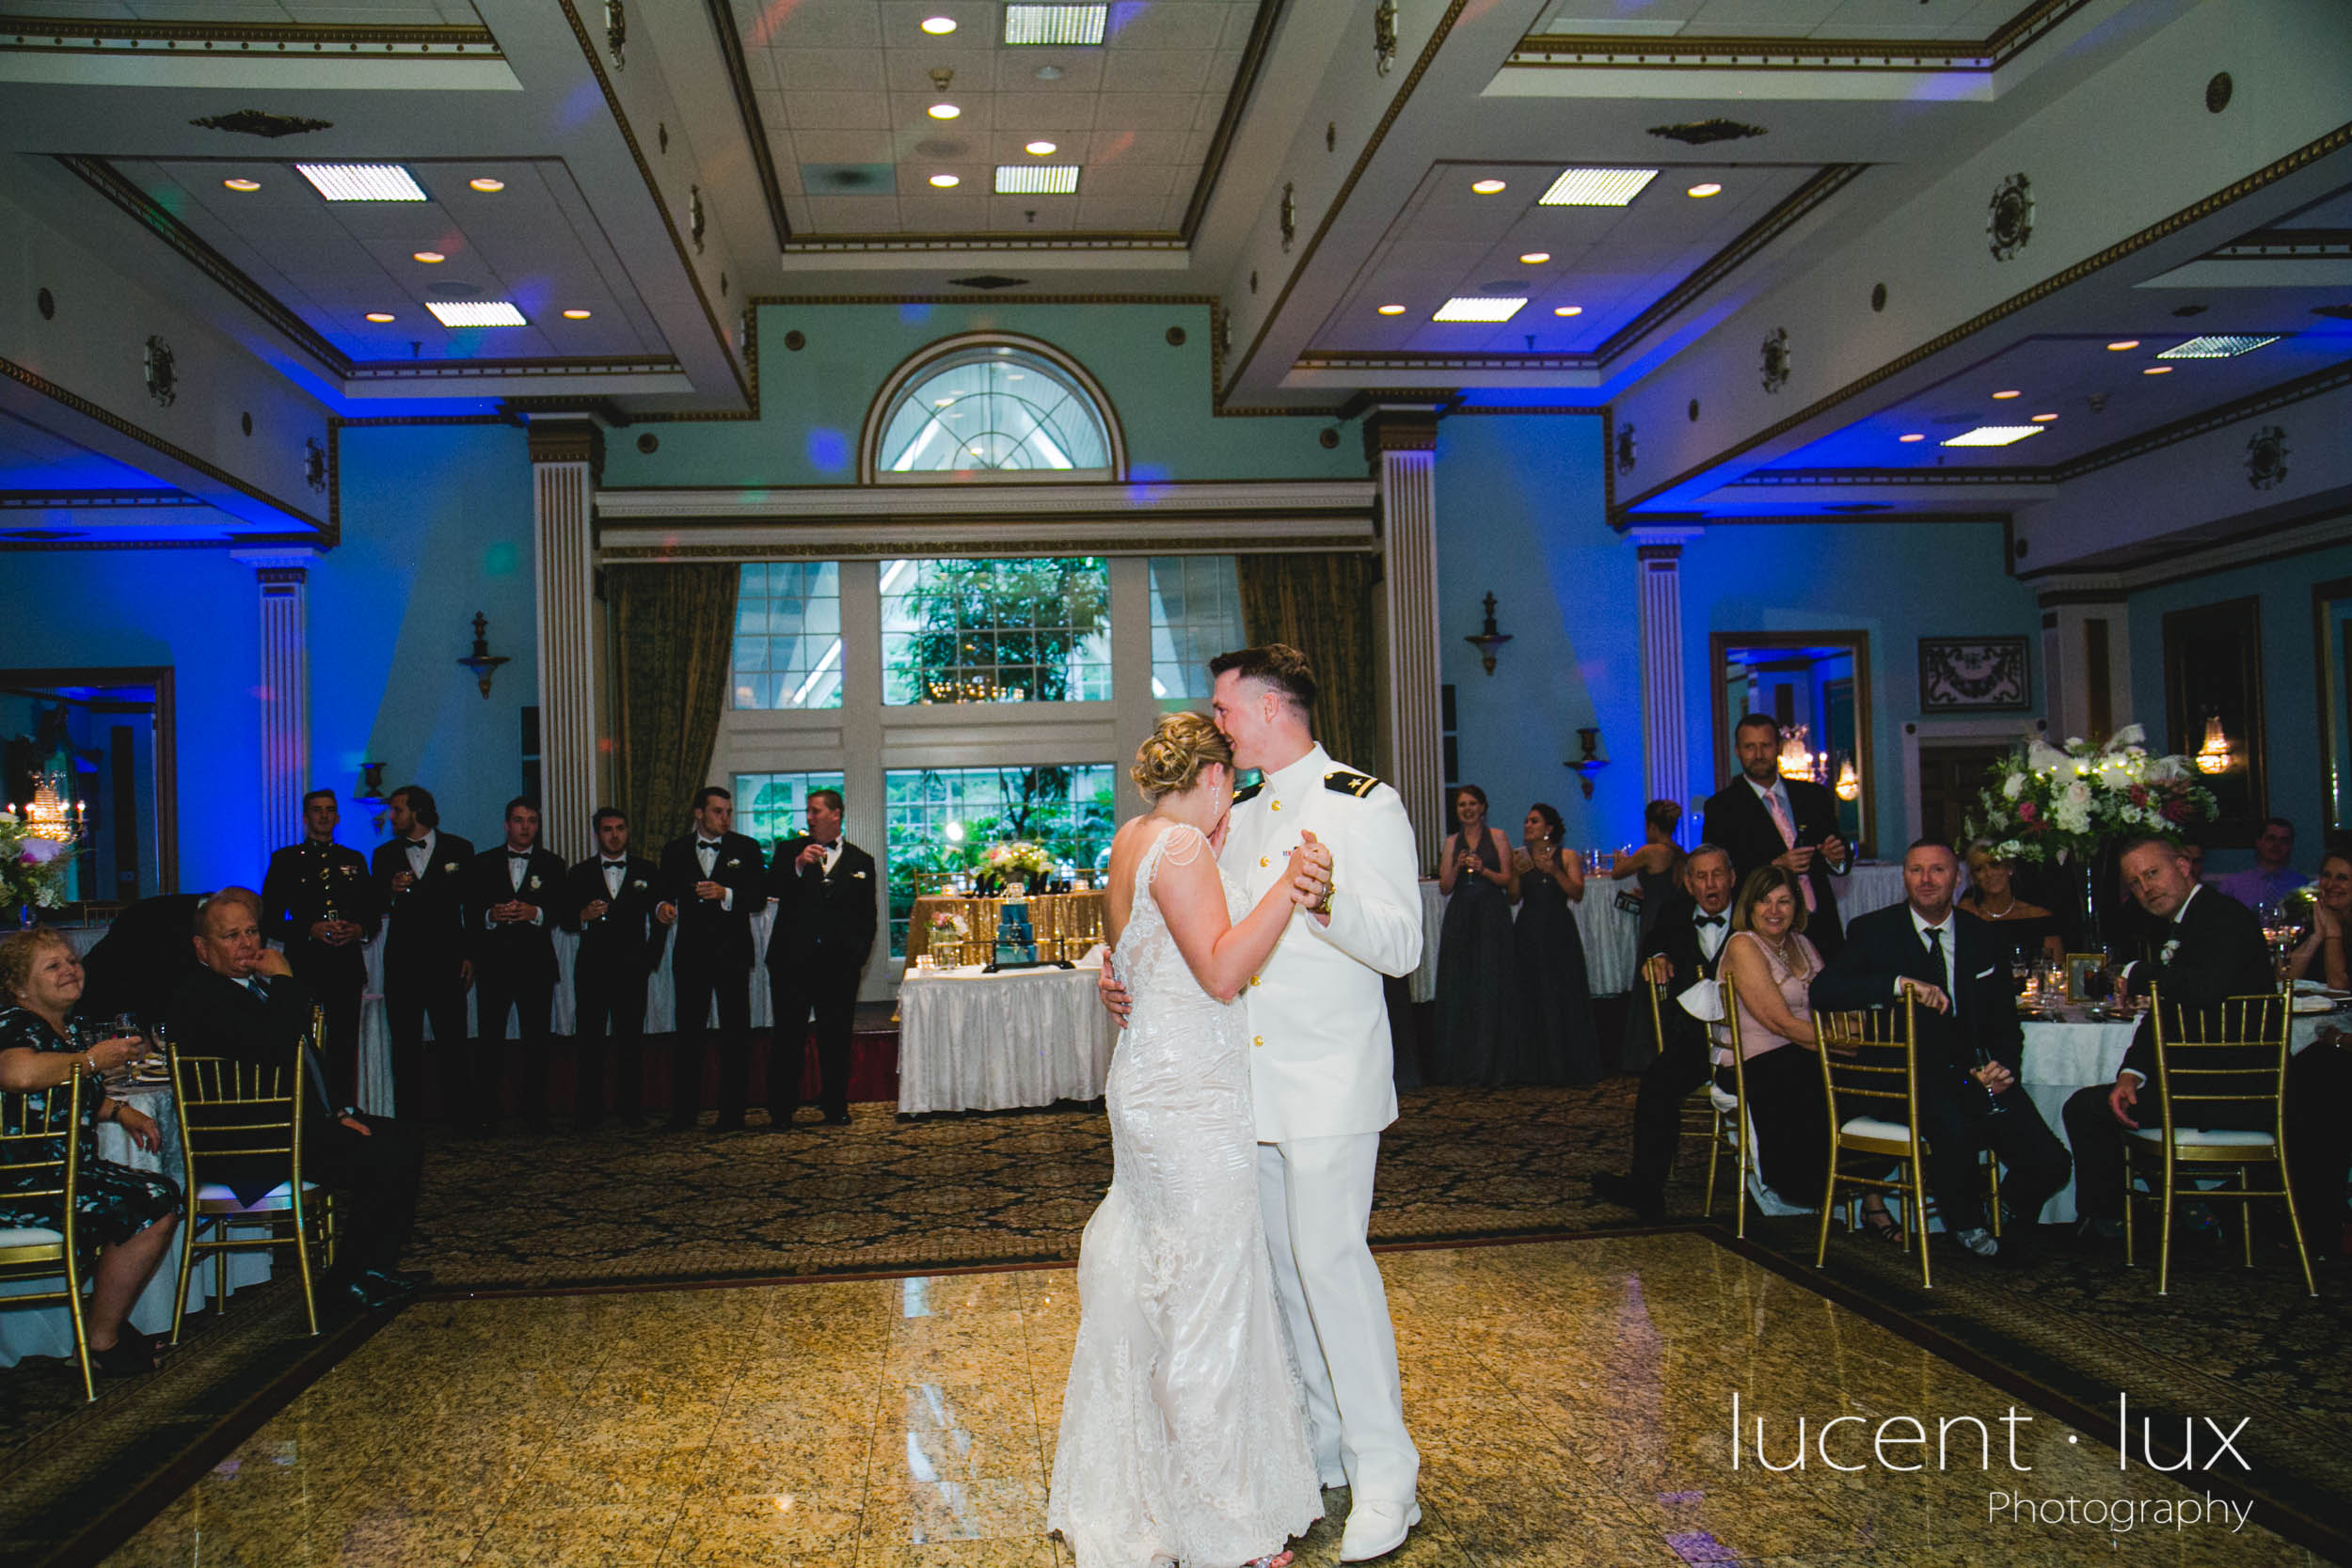 Wedding-Photography-Maryland-Pennsylvania-Photographer-Mendenhall-Inn-Media-Portrait-Event-150.jpg